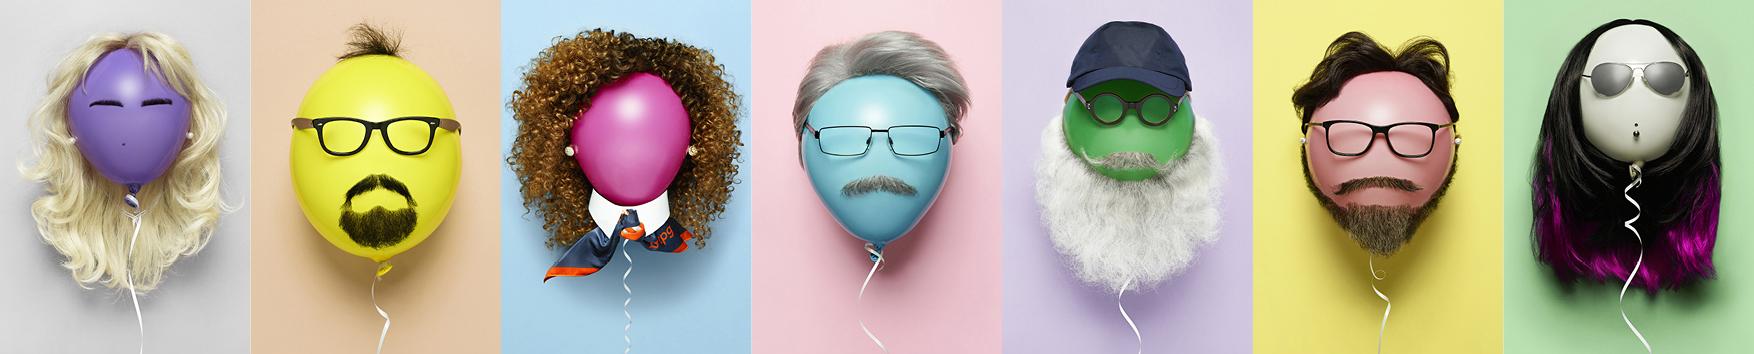 portraits_ballons.jpg